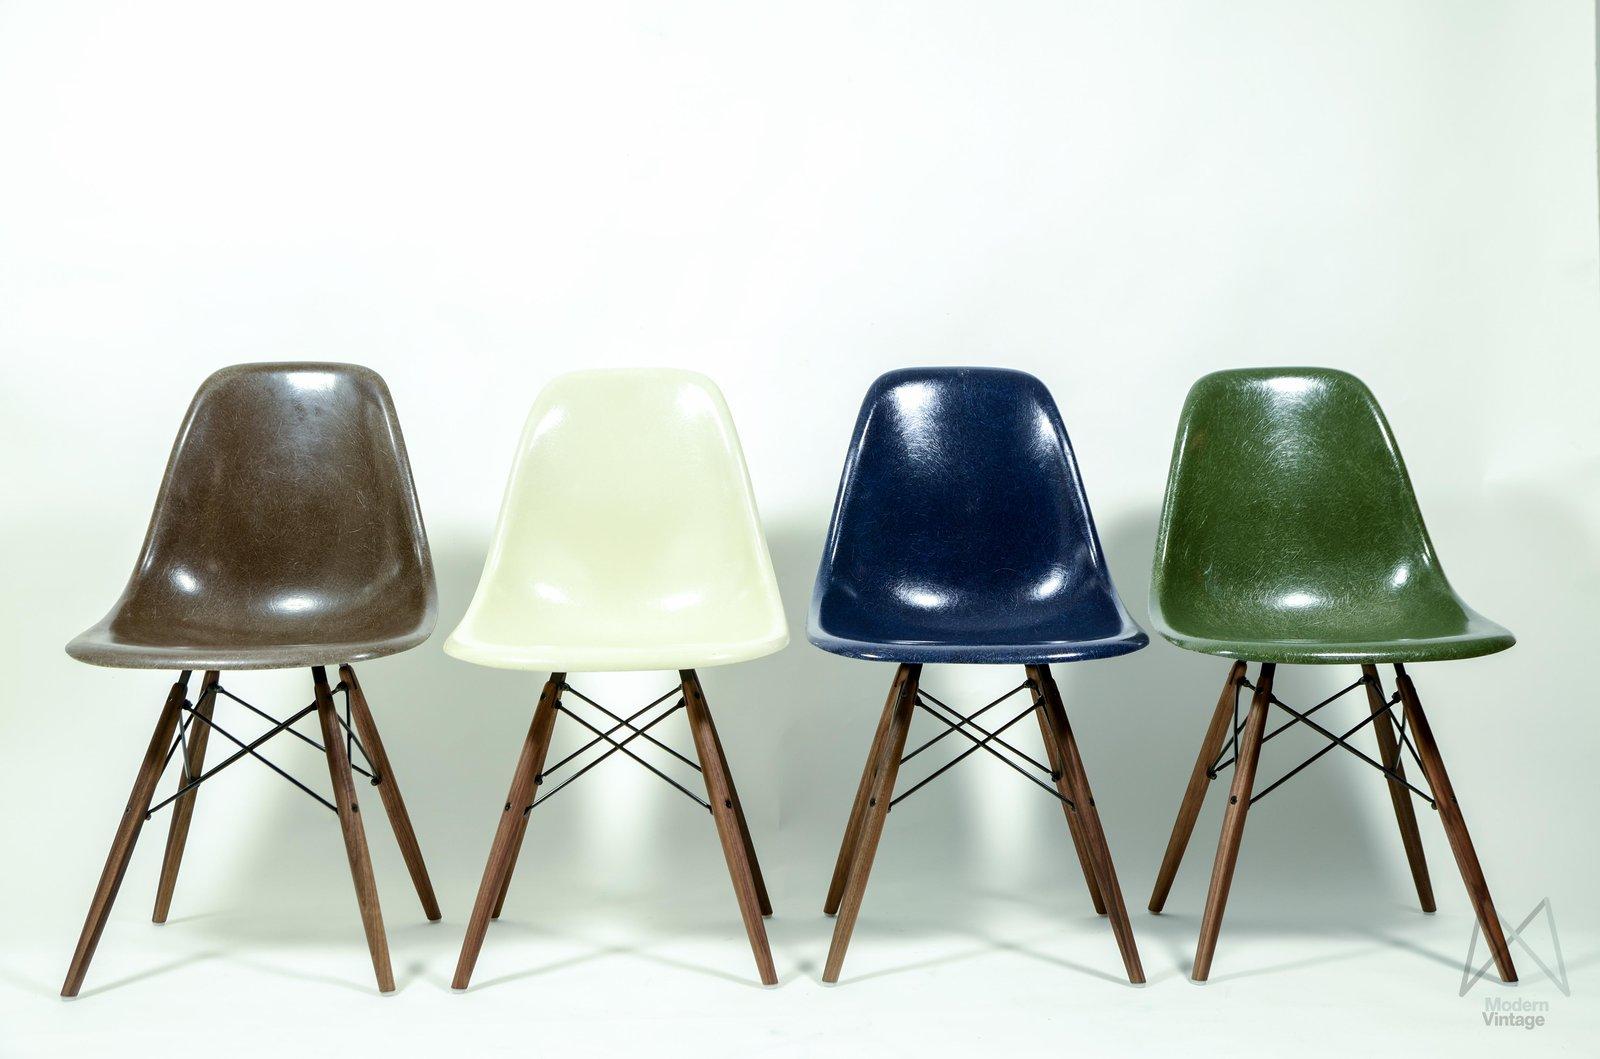 Eames Chair Original modern vintage amsterdam original eames furniture eames original